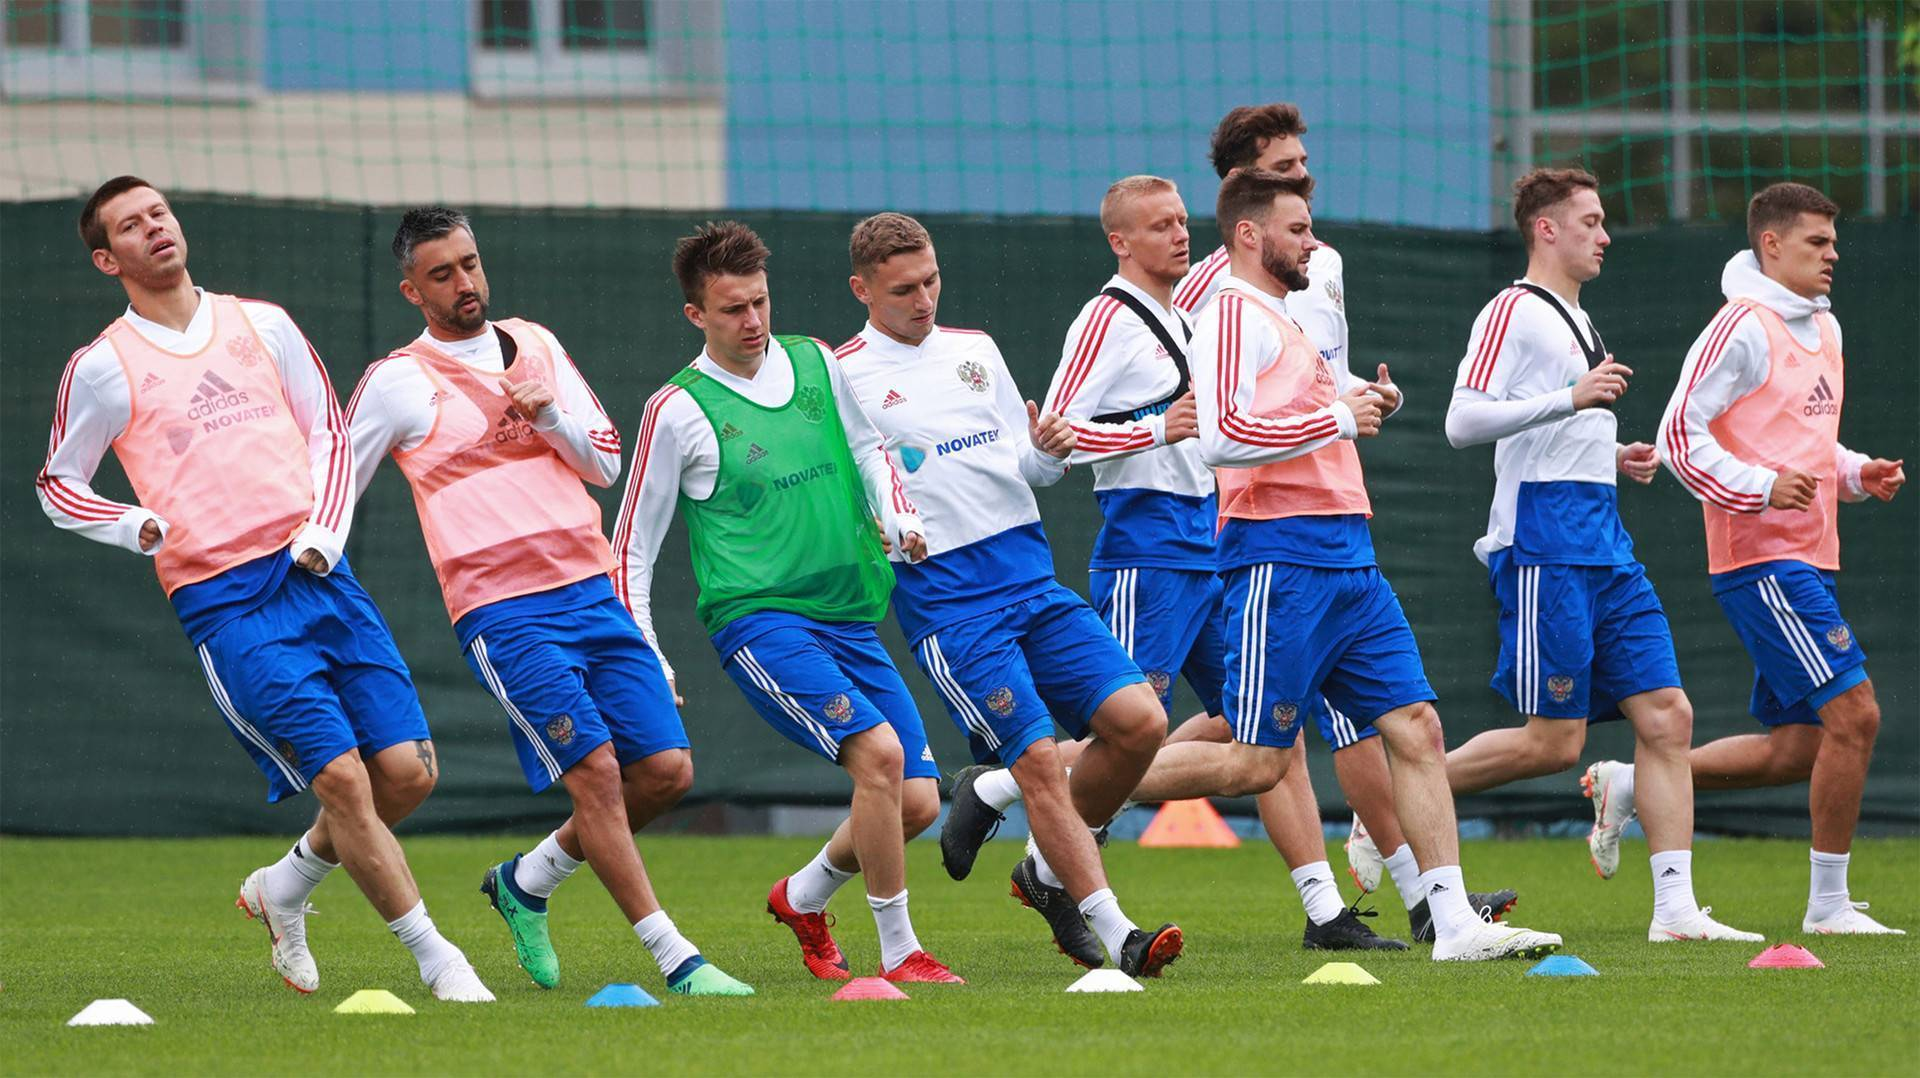 Тест на знание сборной россии по футболу